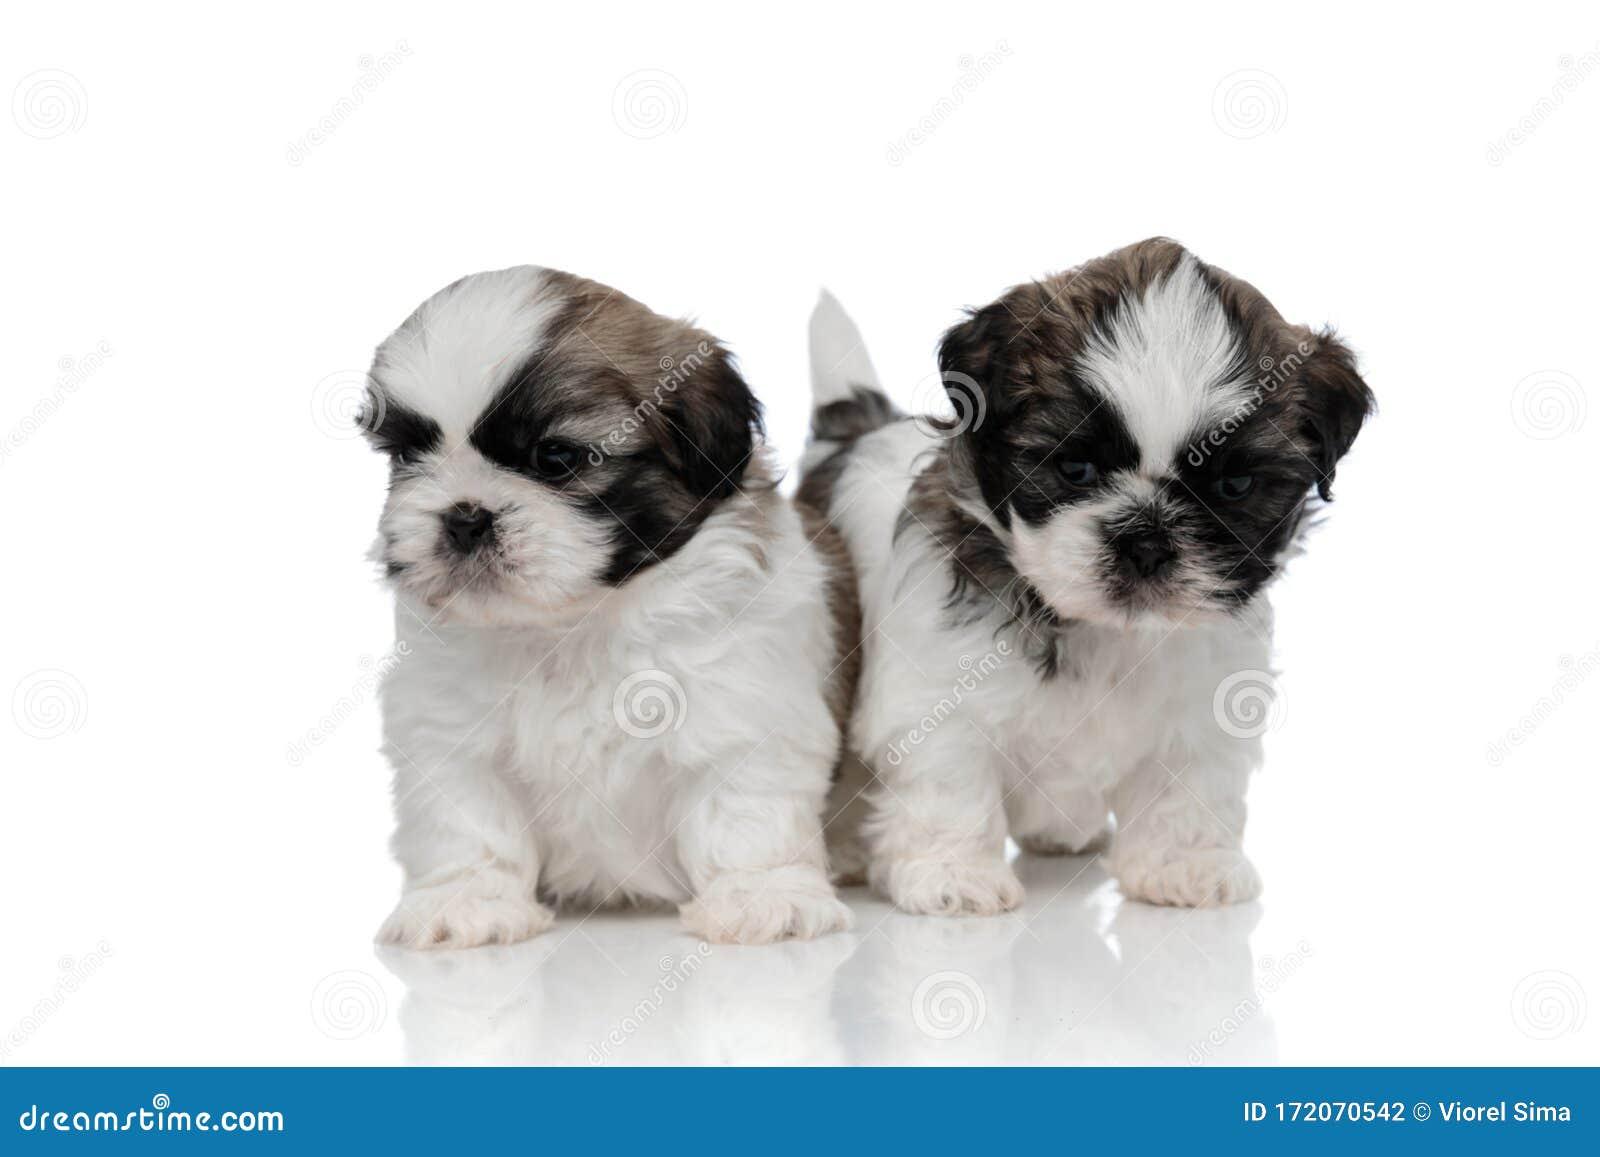 Tough Shih Tzu Puppies Walking Forward Stock Photo Image Of Looking Couple 172070542